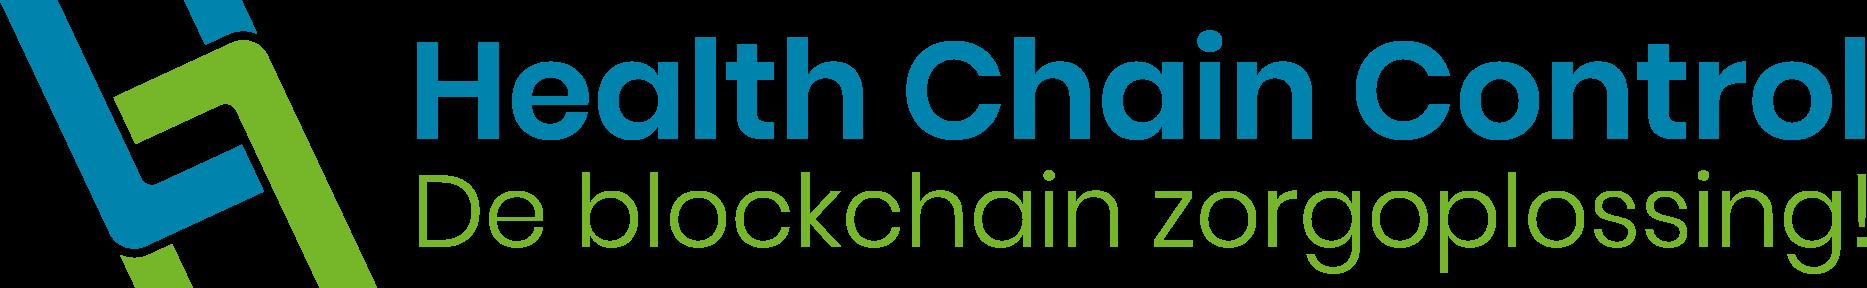 Health Chain Control